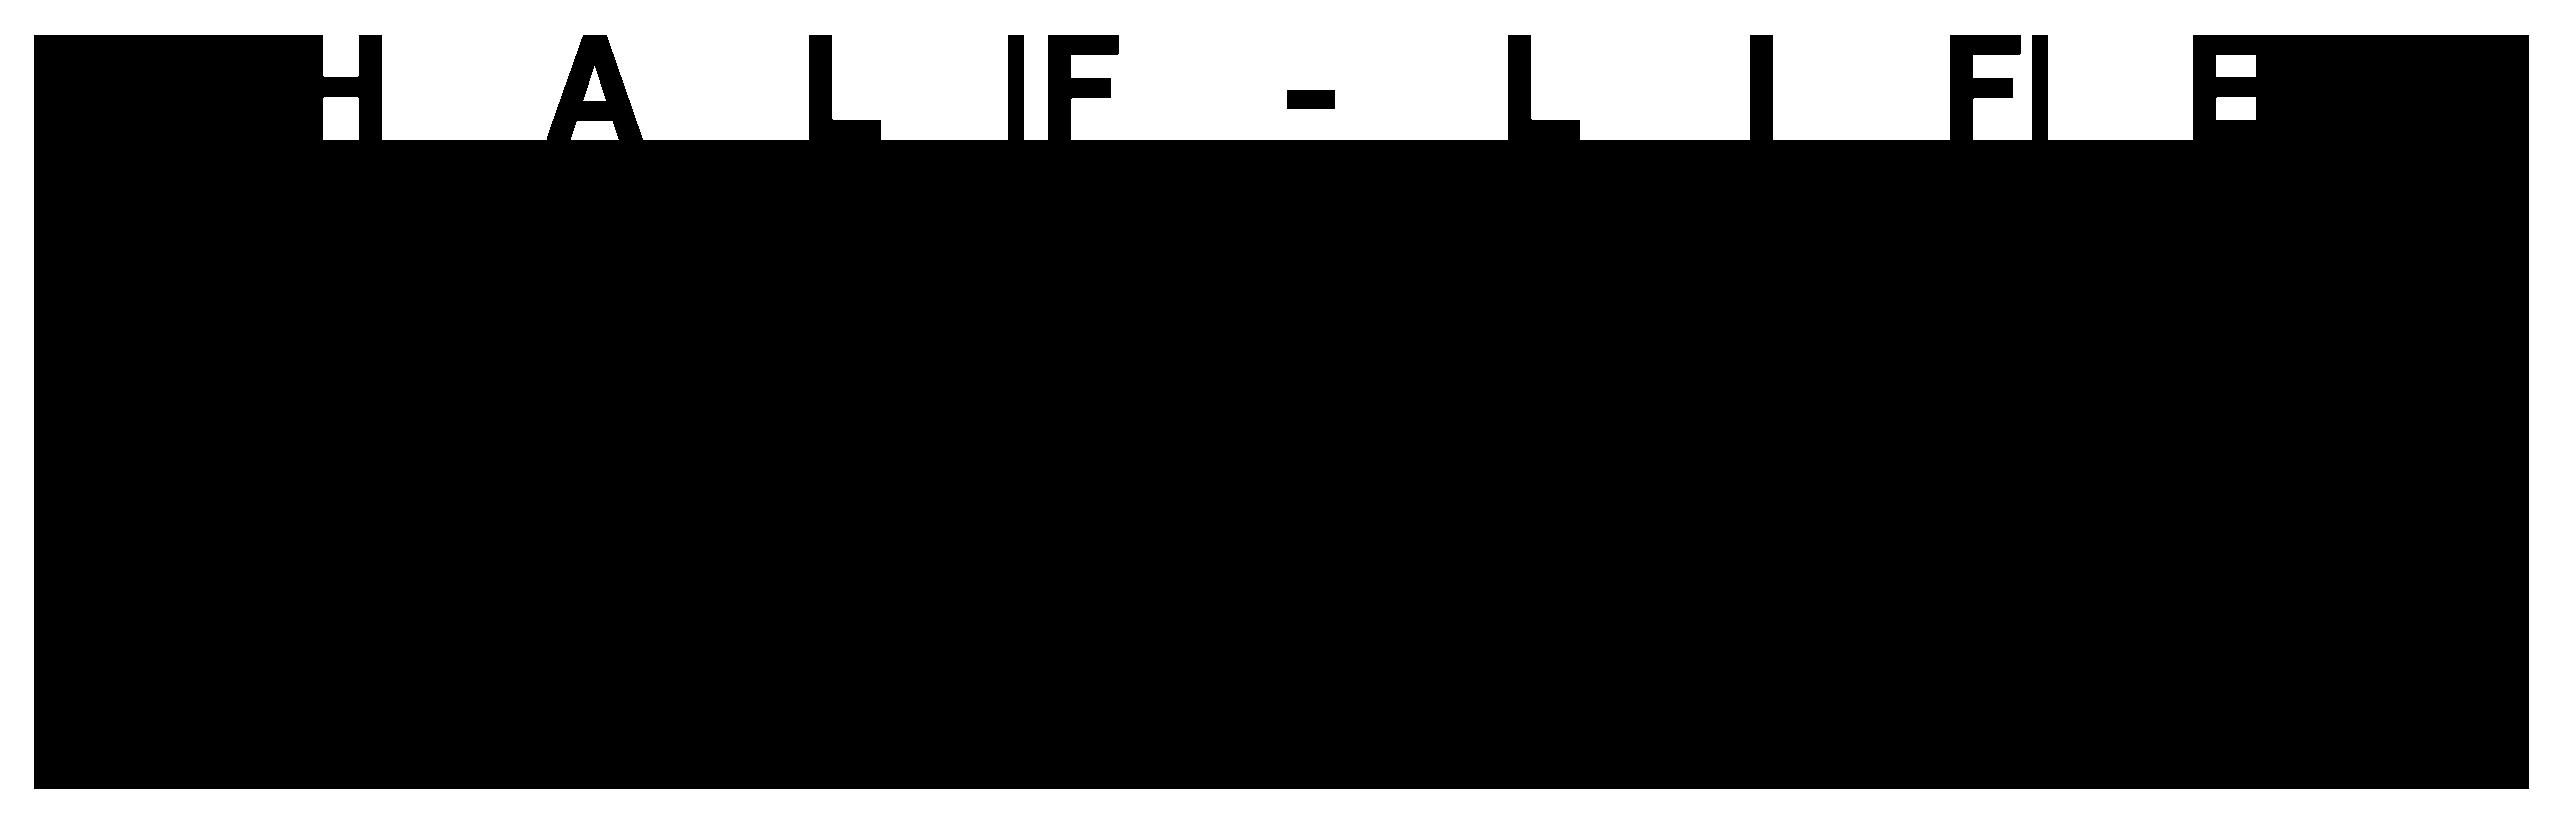 Half-Life-Alyx-codes-free-activation